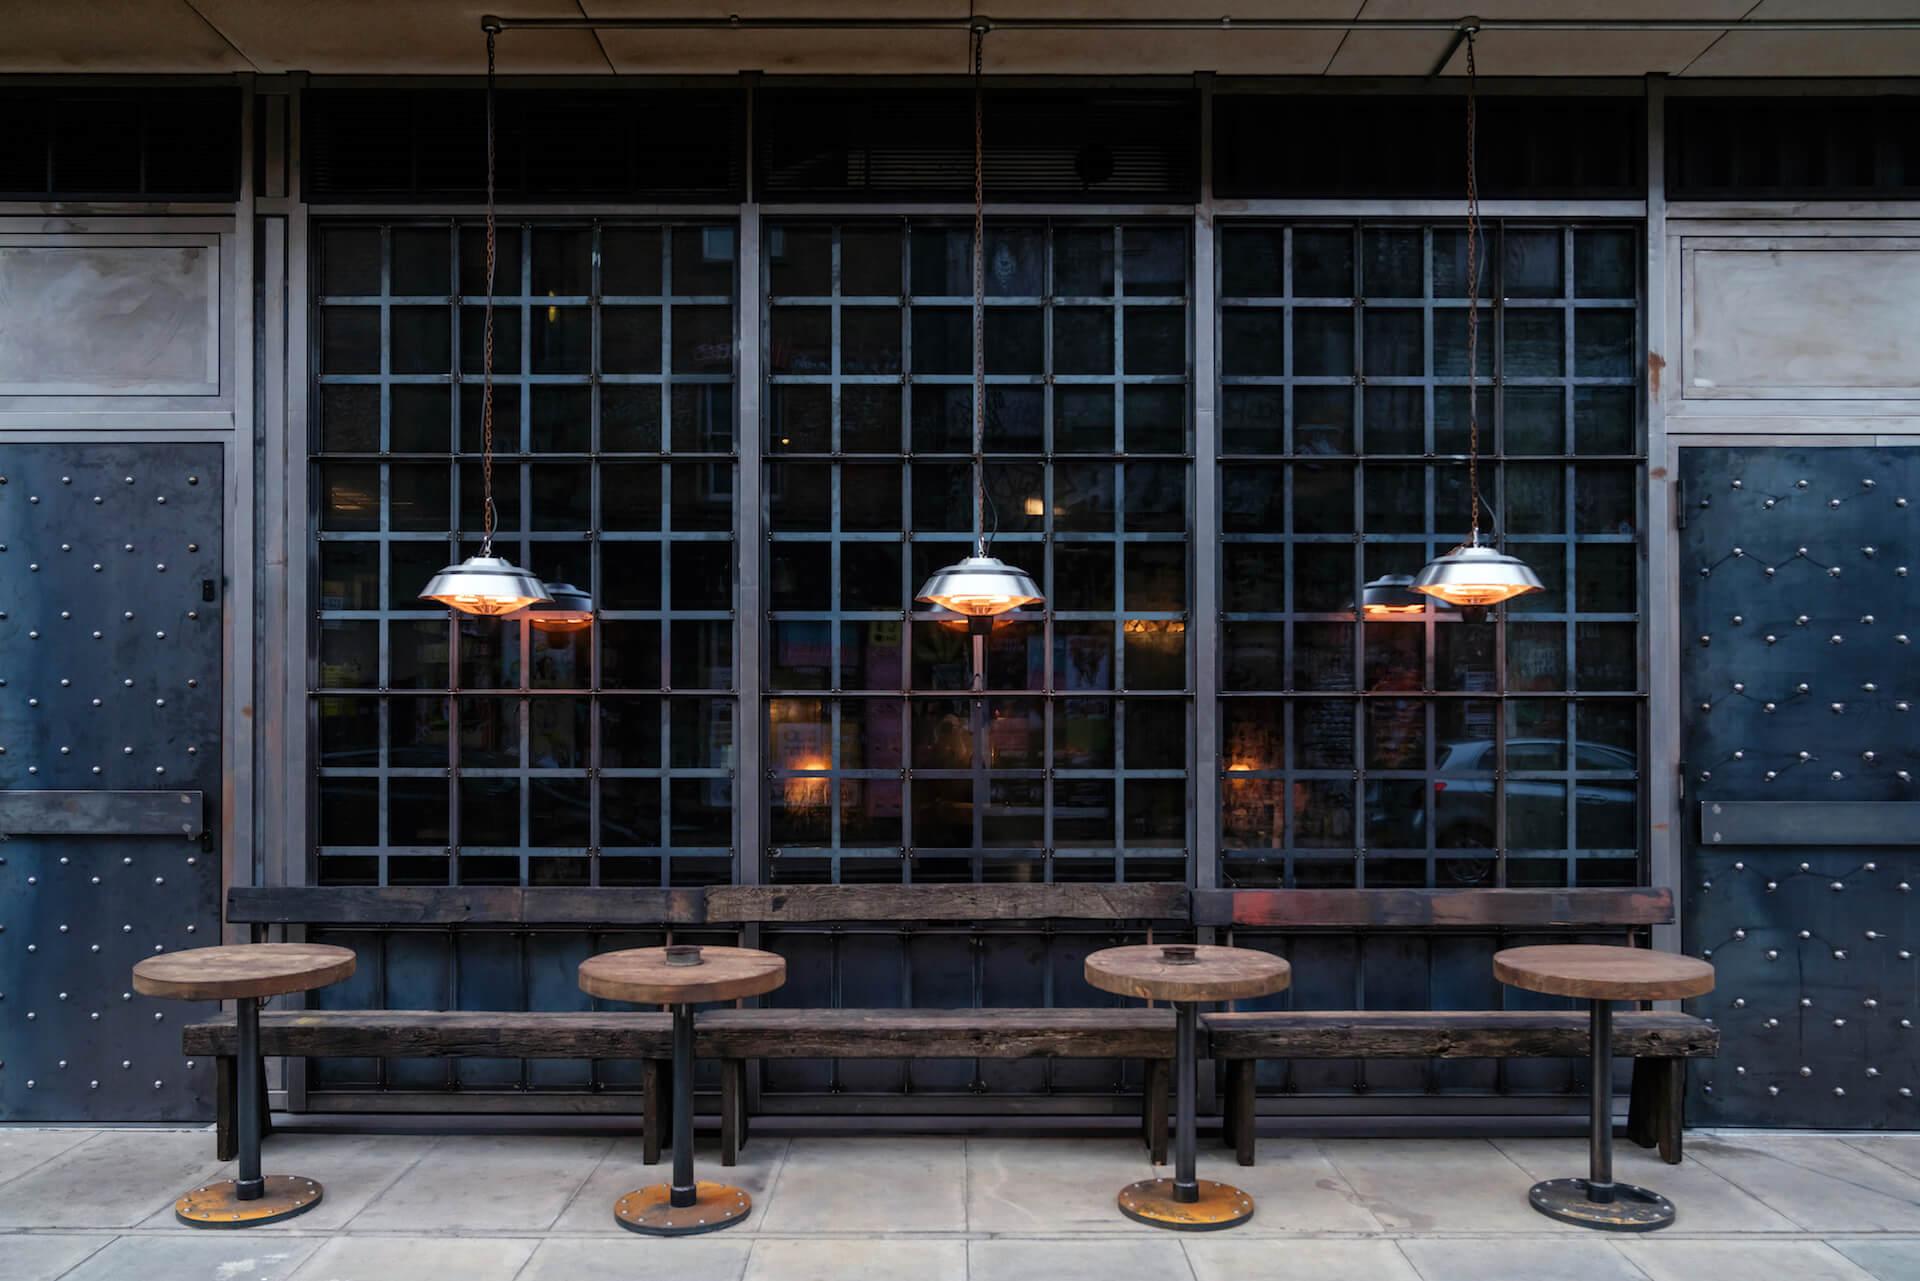 Smokestak open again outdoor seating